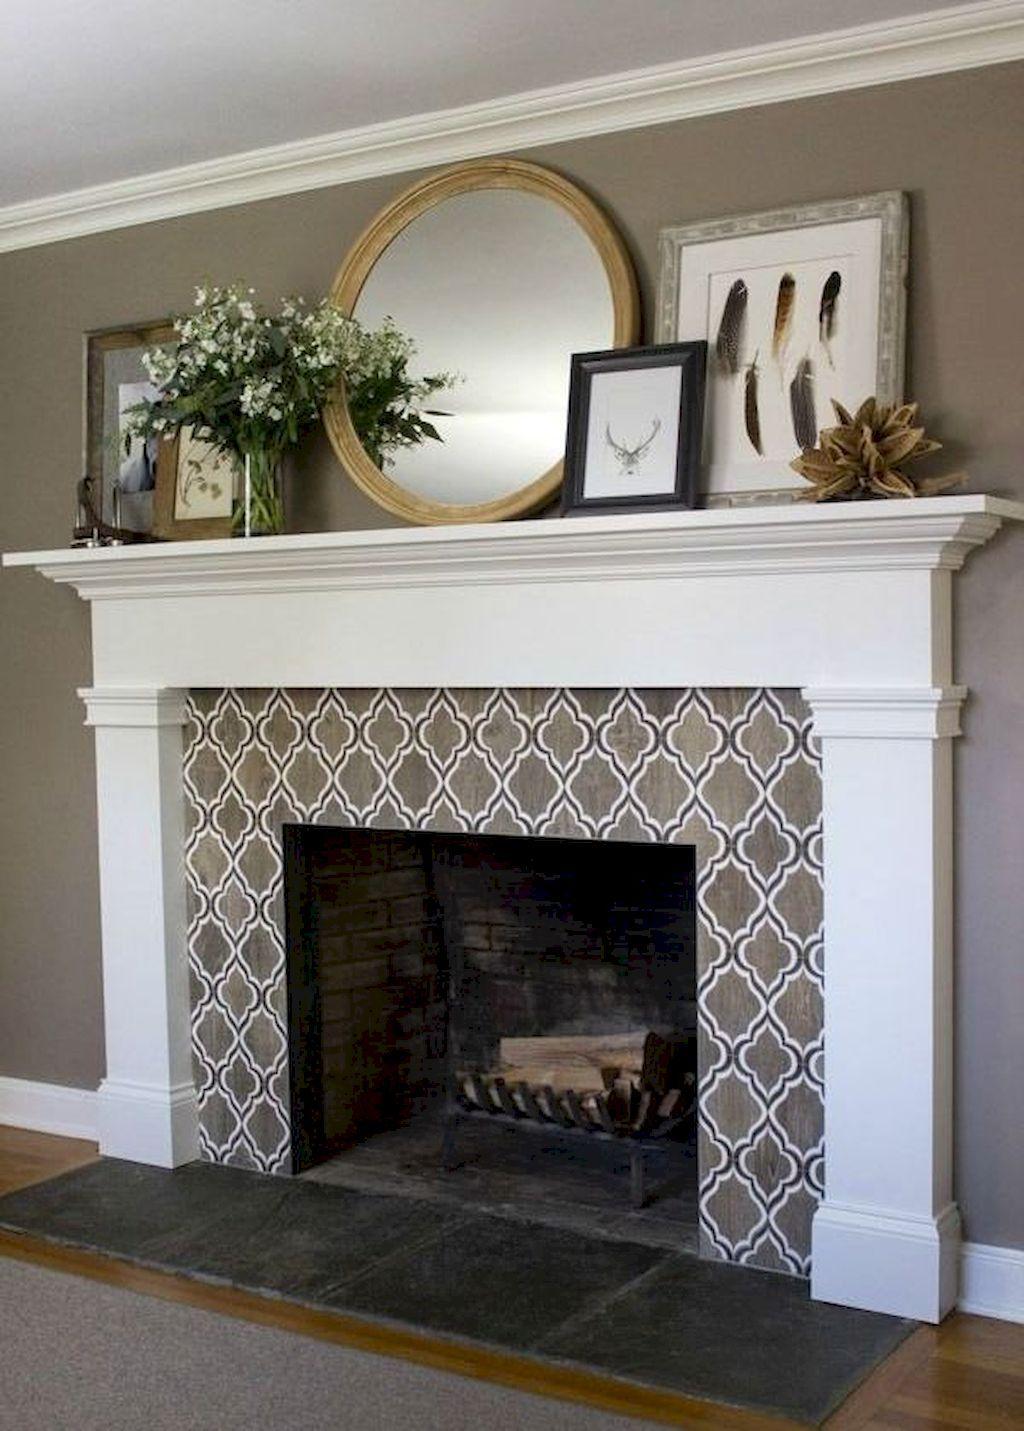 60 inspiring fireplace ideas for your living room living room rh pinterest com